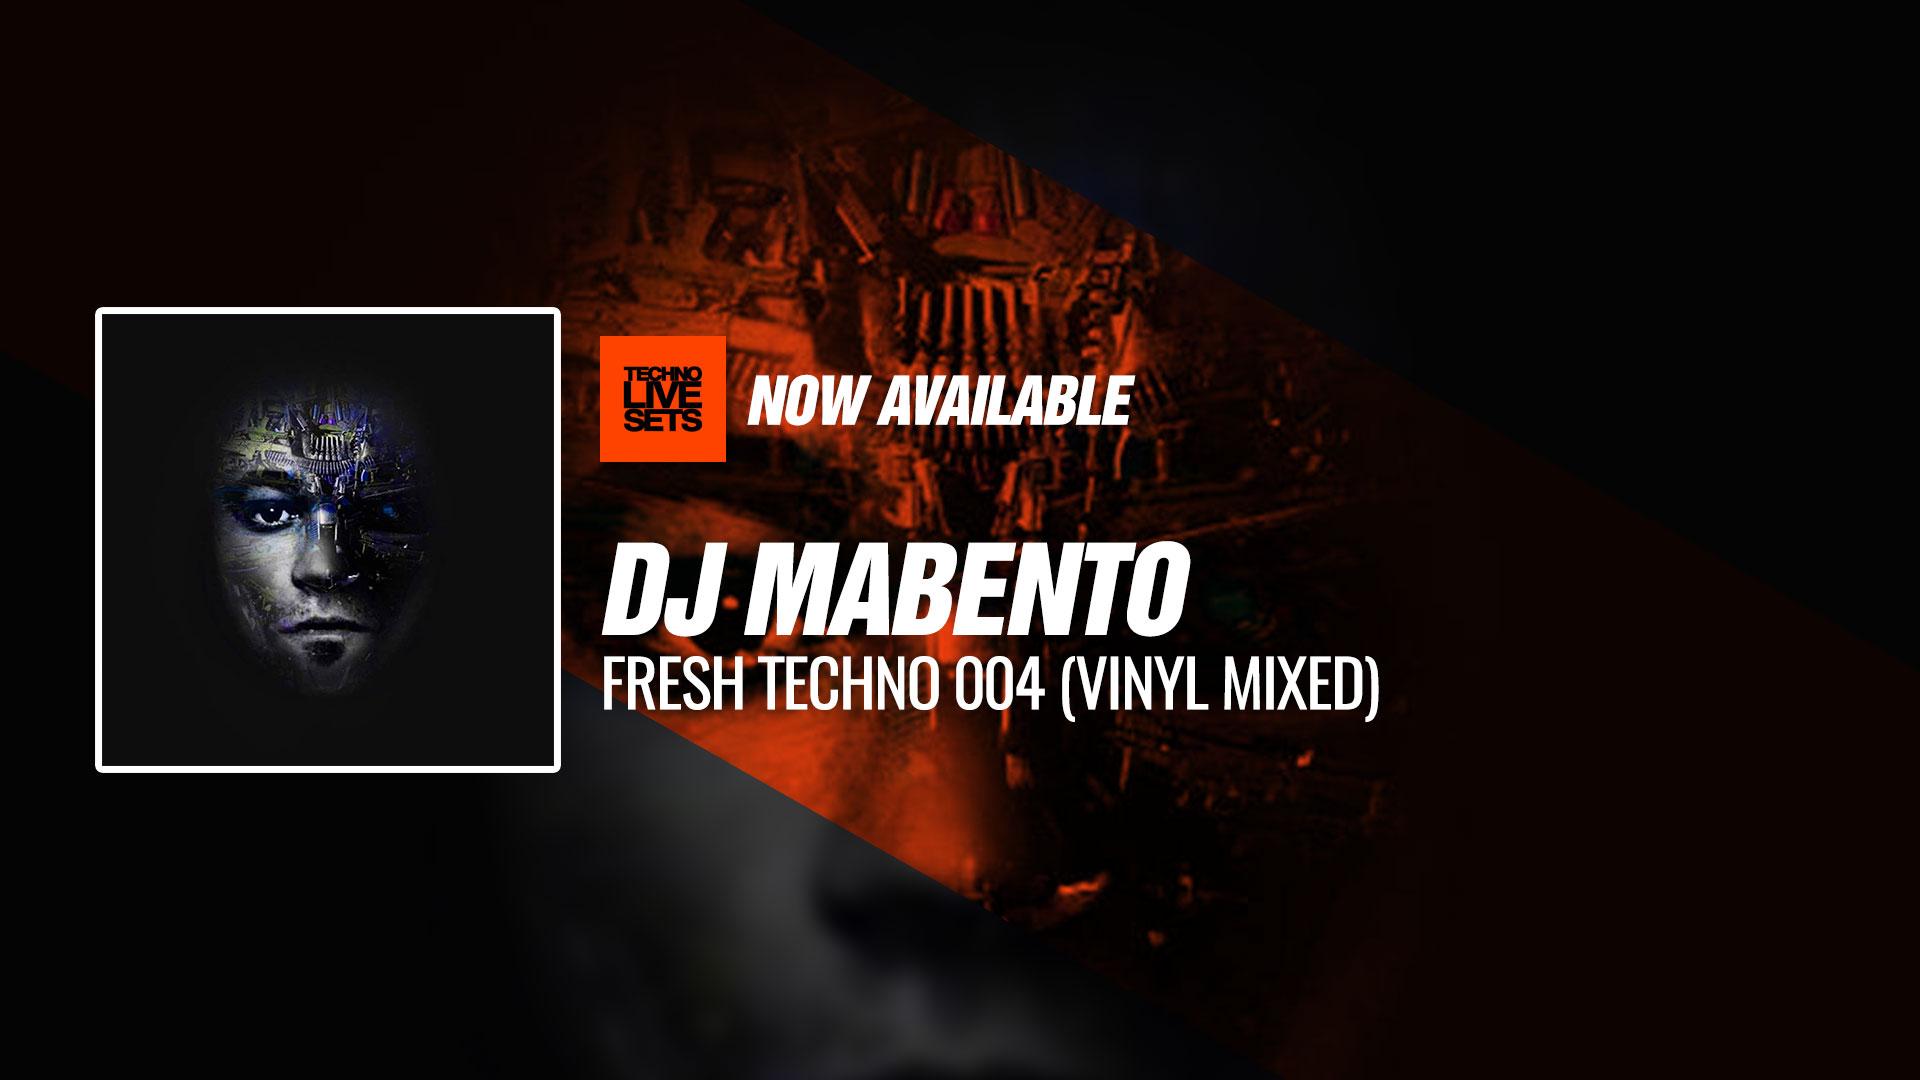 Dj Mabento 2018 Fresh Techno 004 Vinyl Mixed 08 12 2018